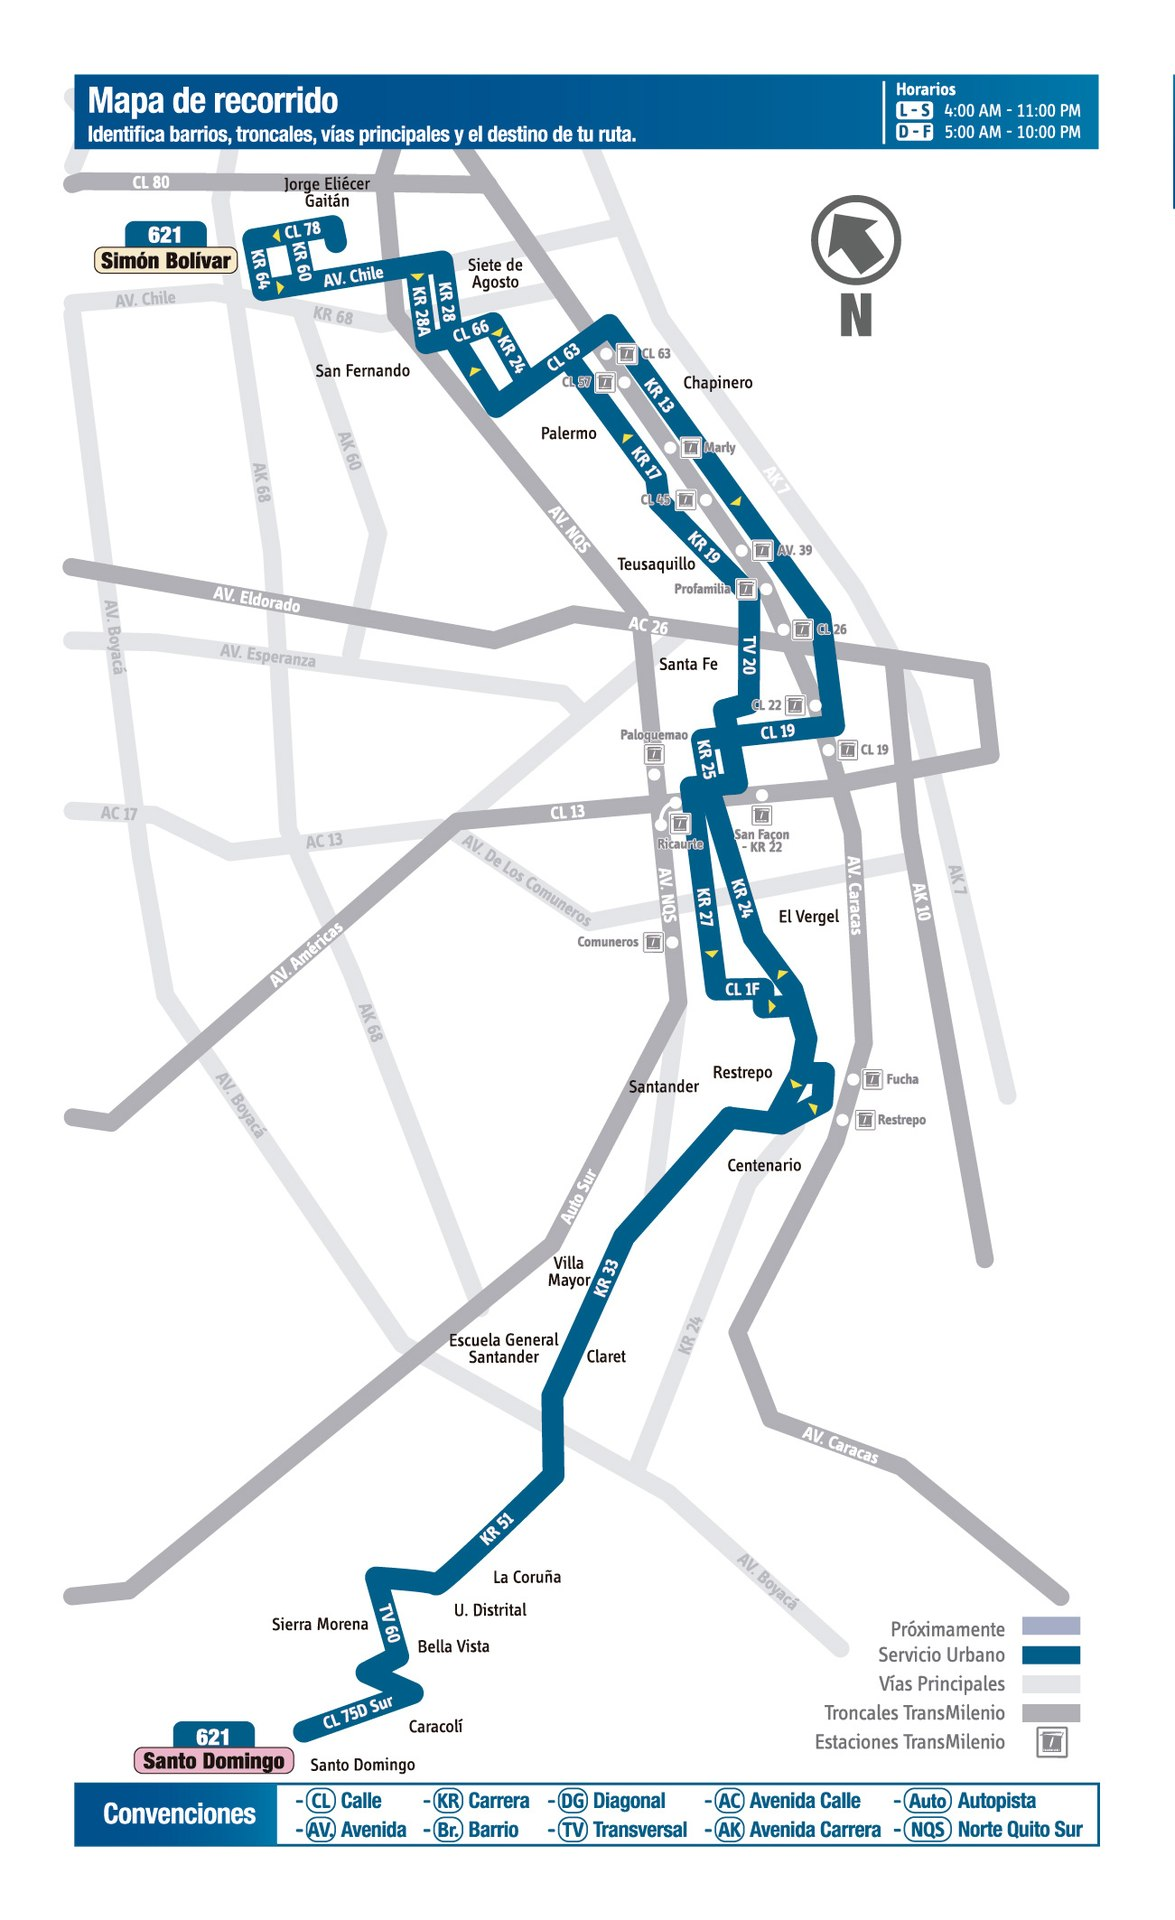 Ruta SITP: 621 Simon Bolívar ↔ Santo Domingo [Urbana] 3